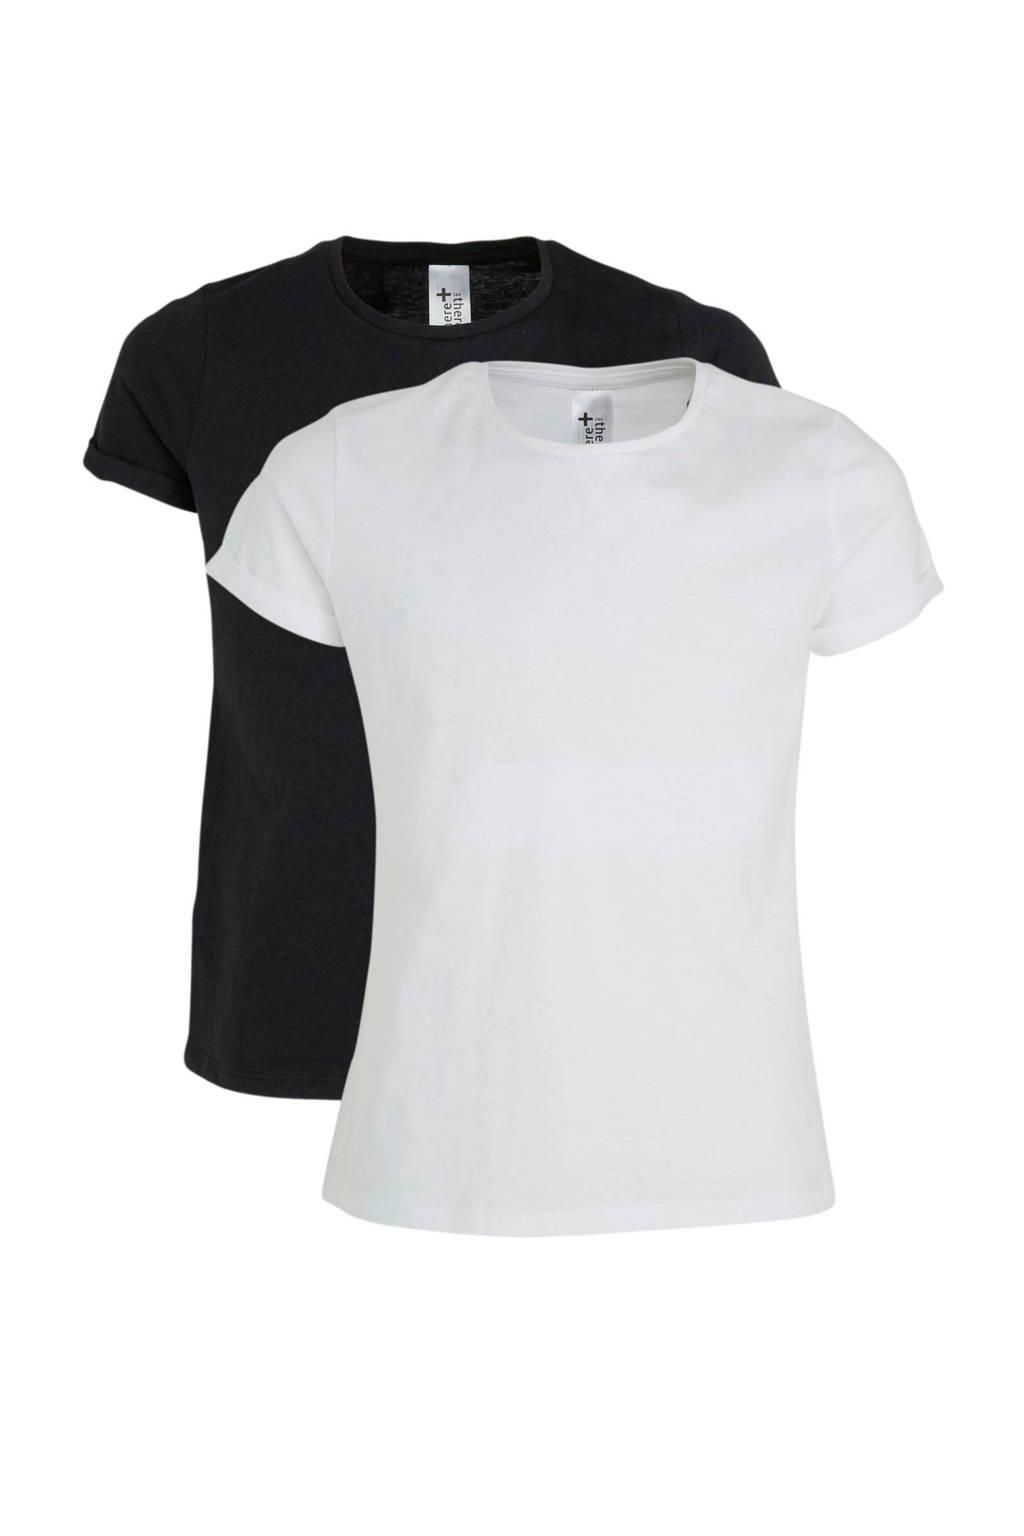 C&A Here & There basic T-shirt - (set van 2), Zwart/wit